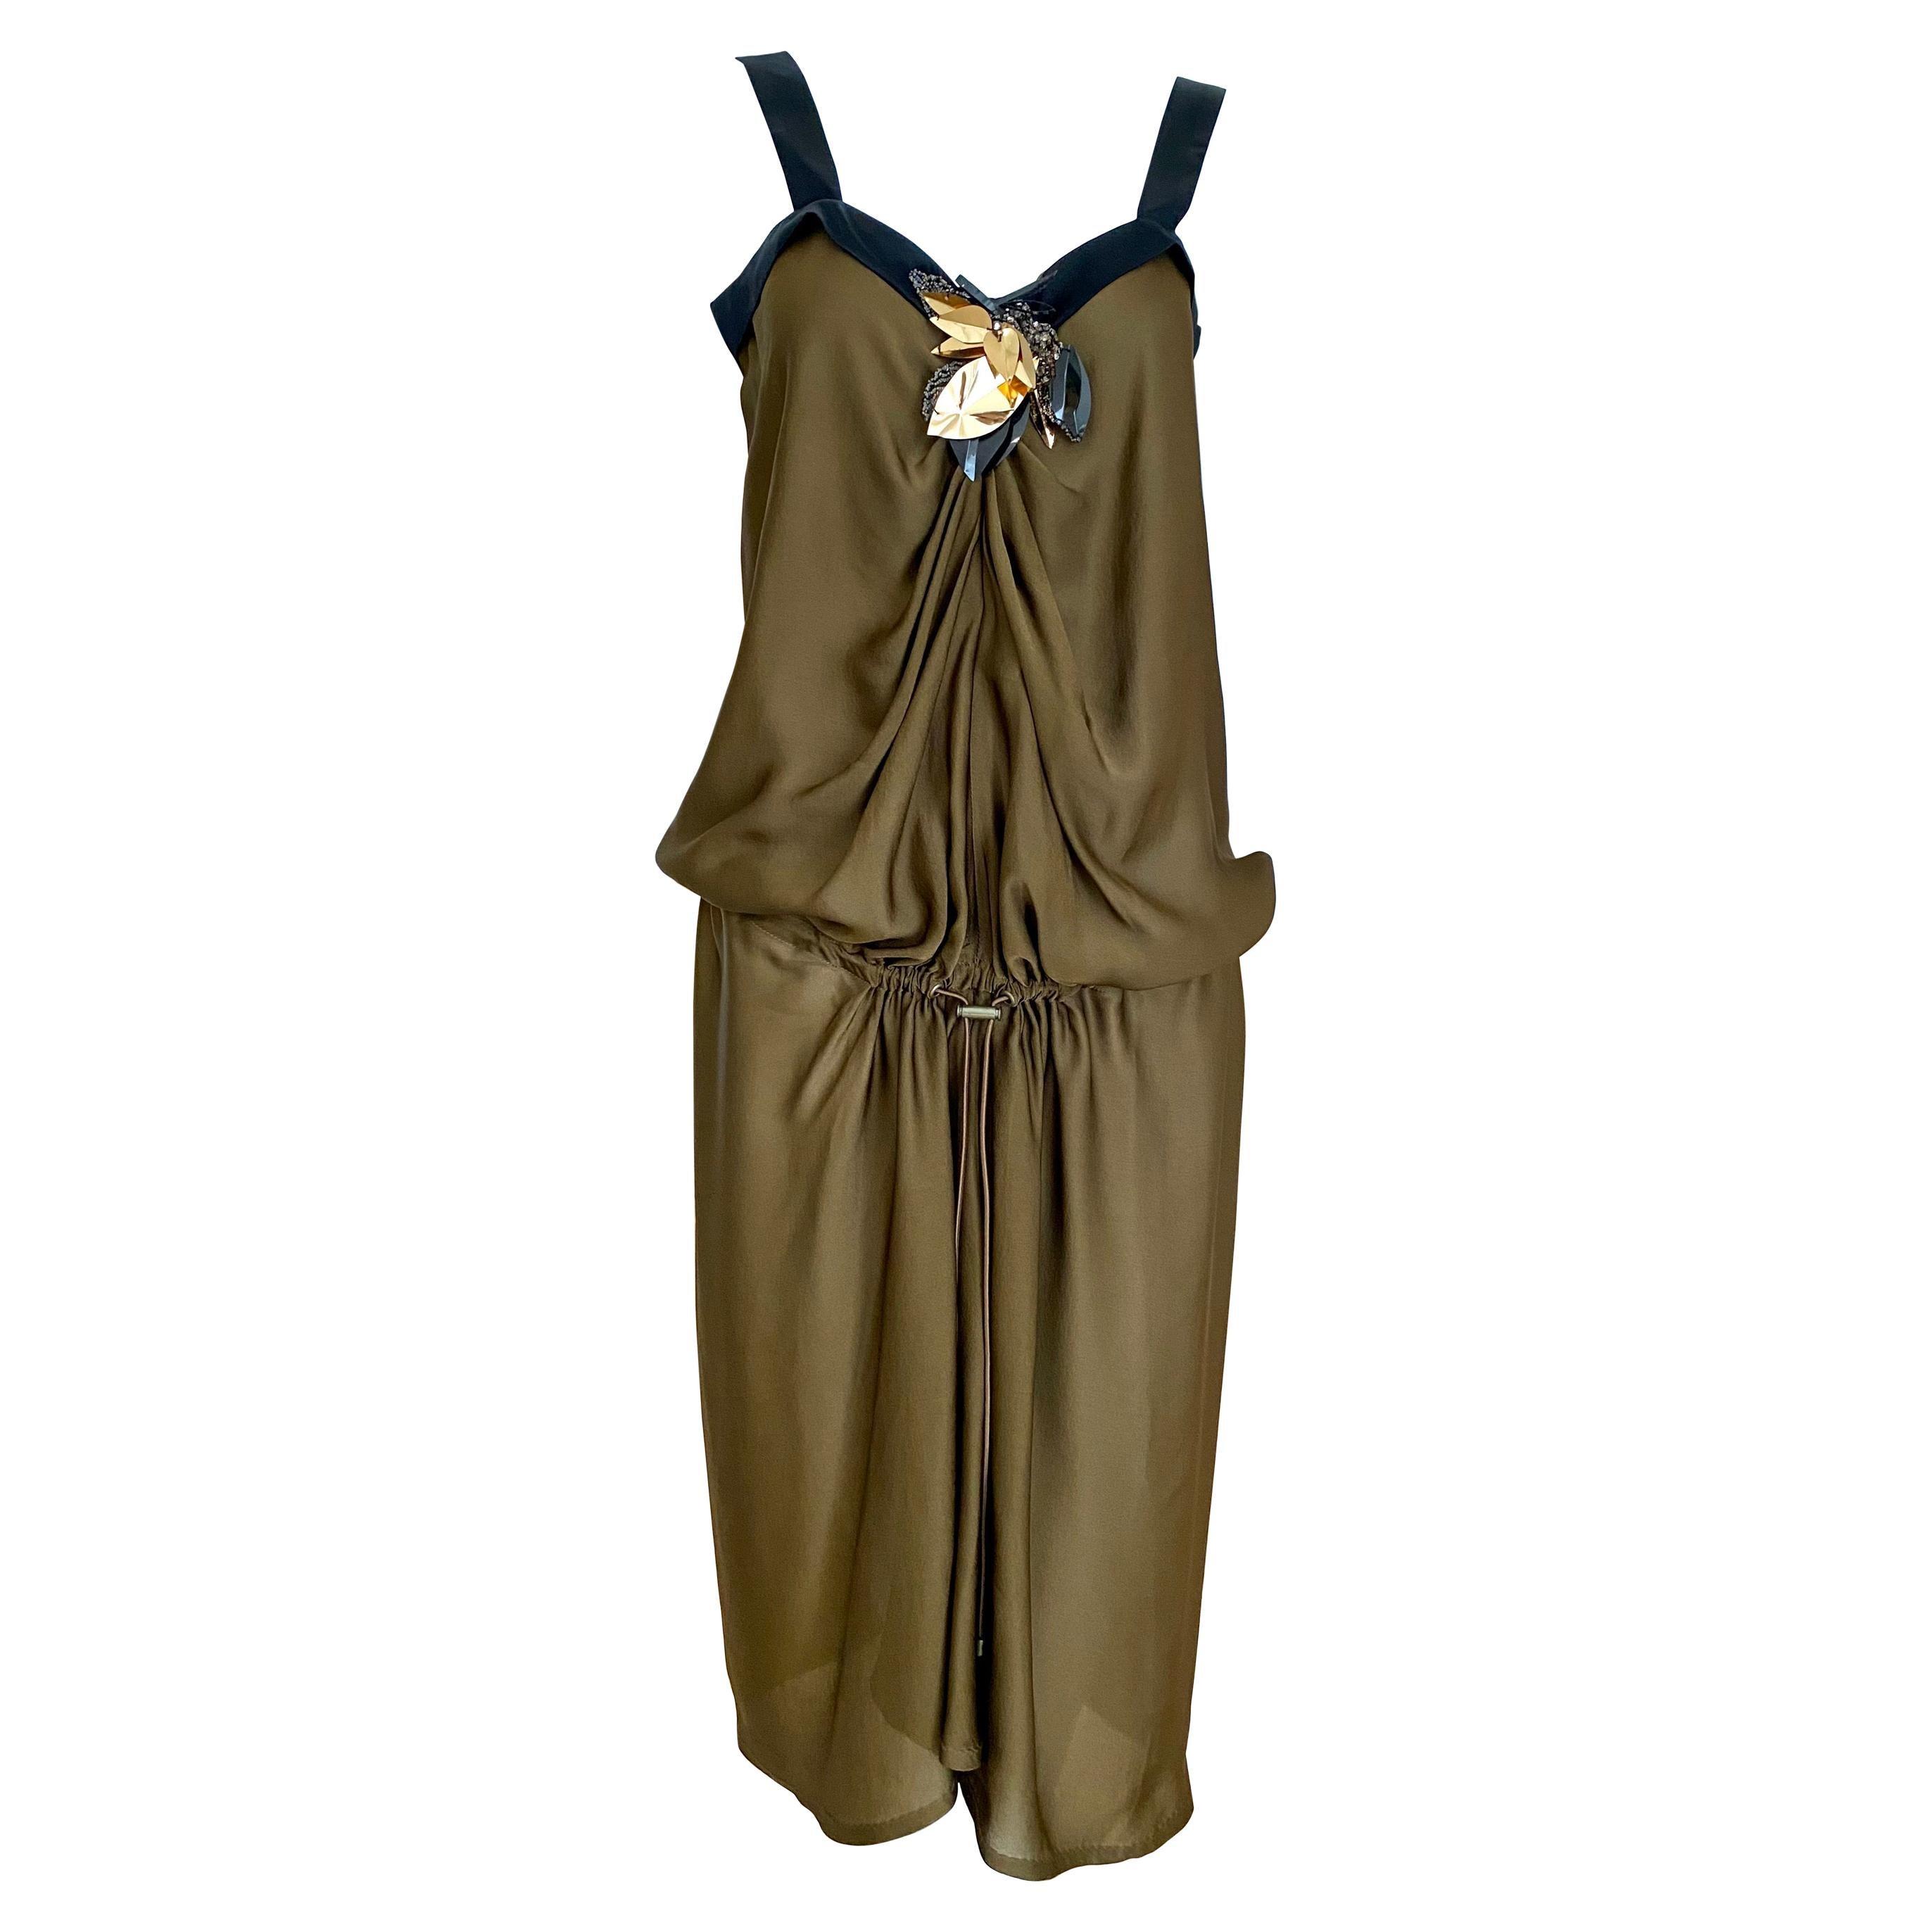 Lanvin by Alber Elbaz Brown Silk Dress